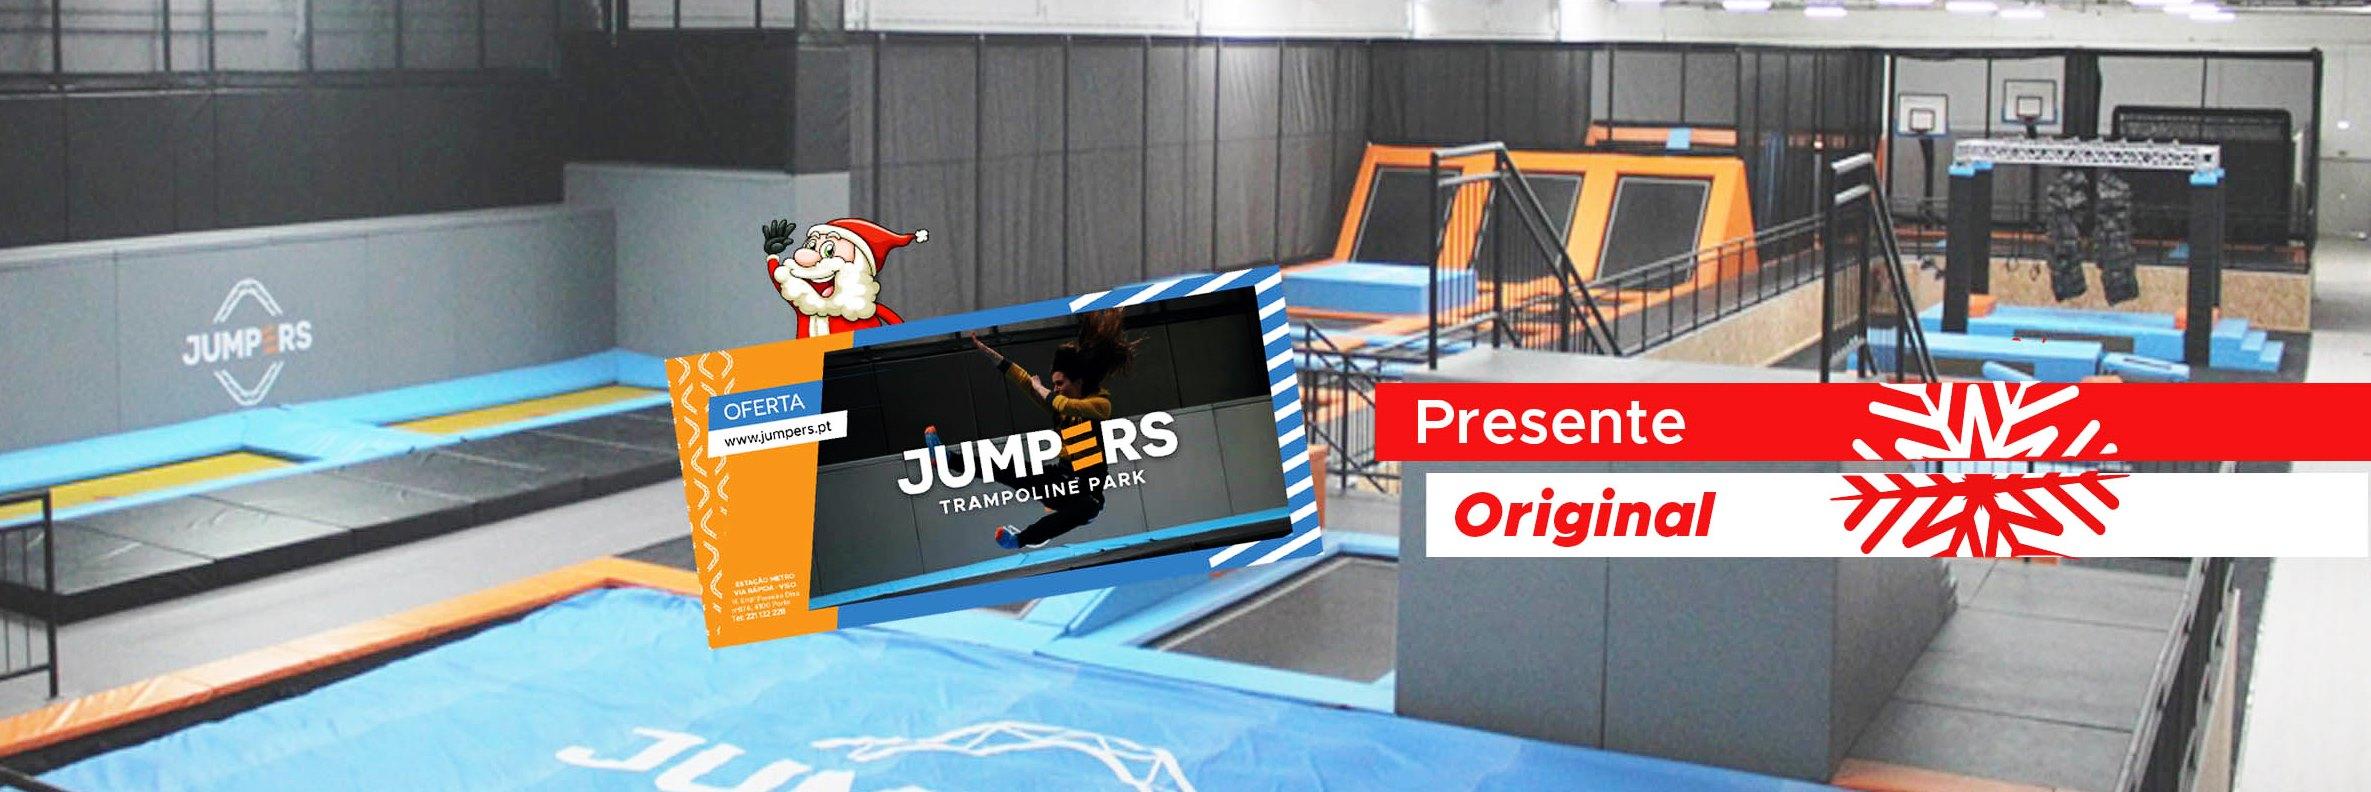 site--jumpers-tramplins-porto-aniversario.jpg